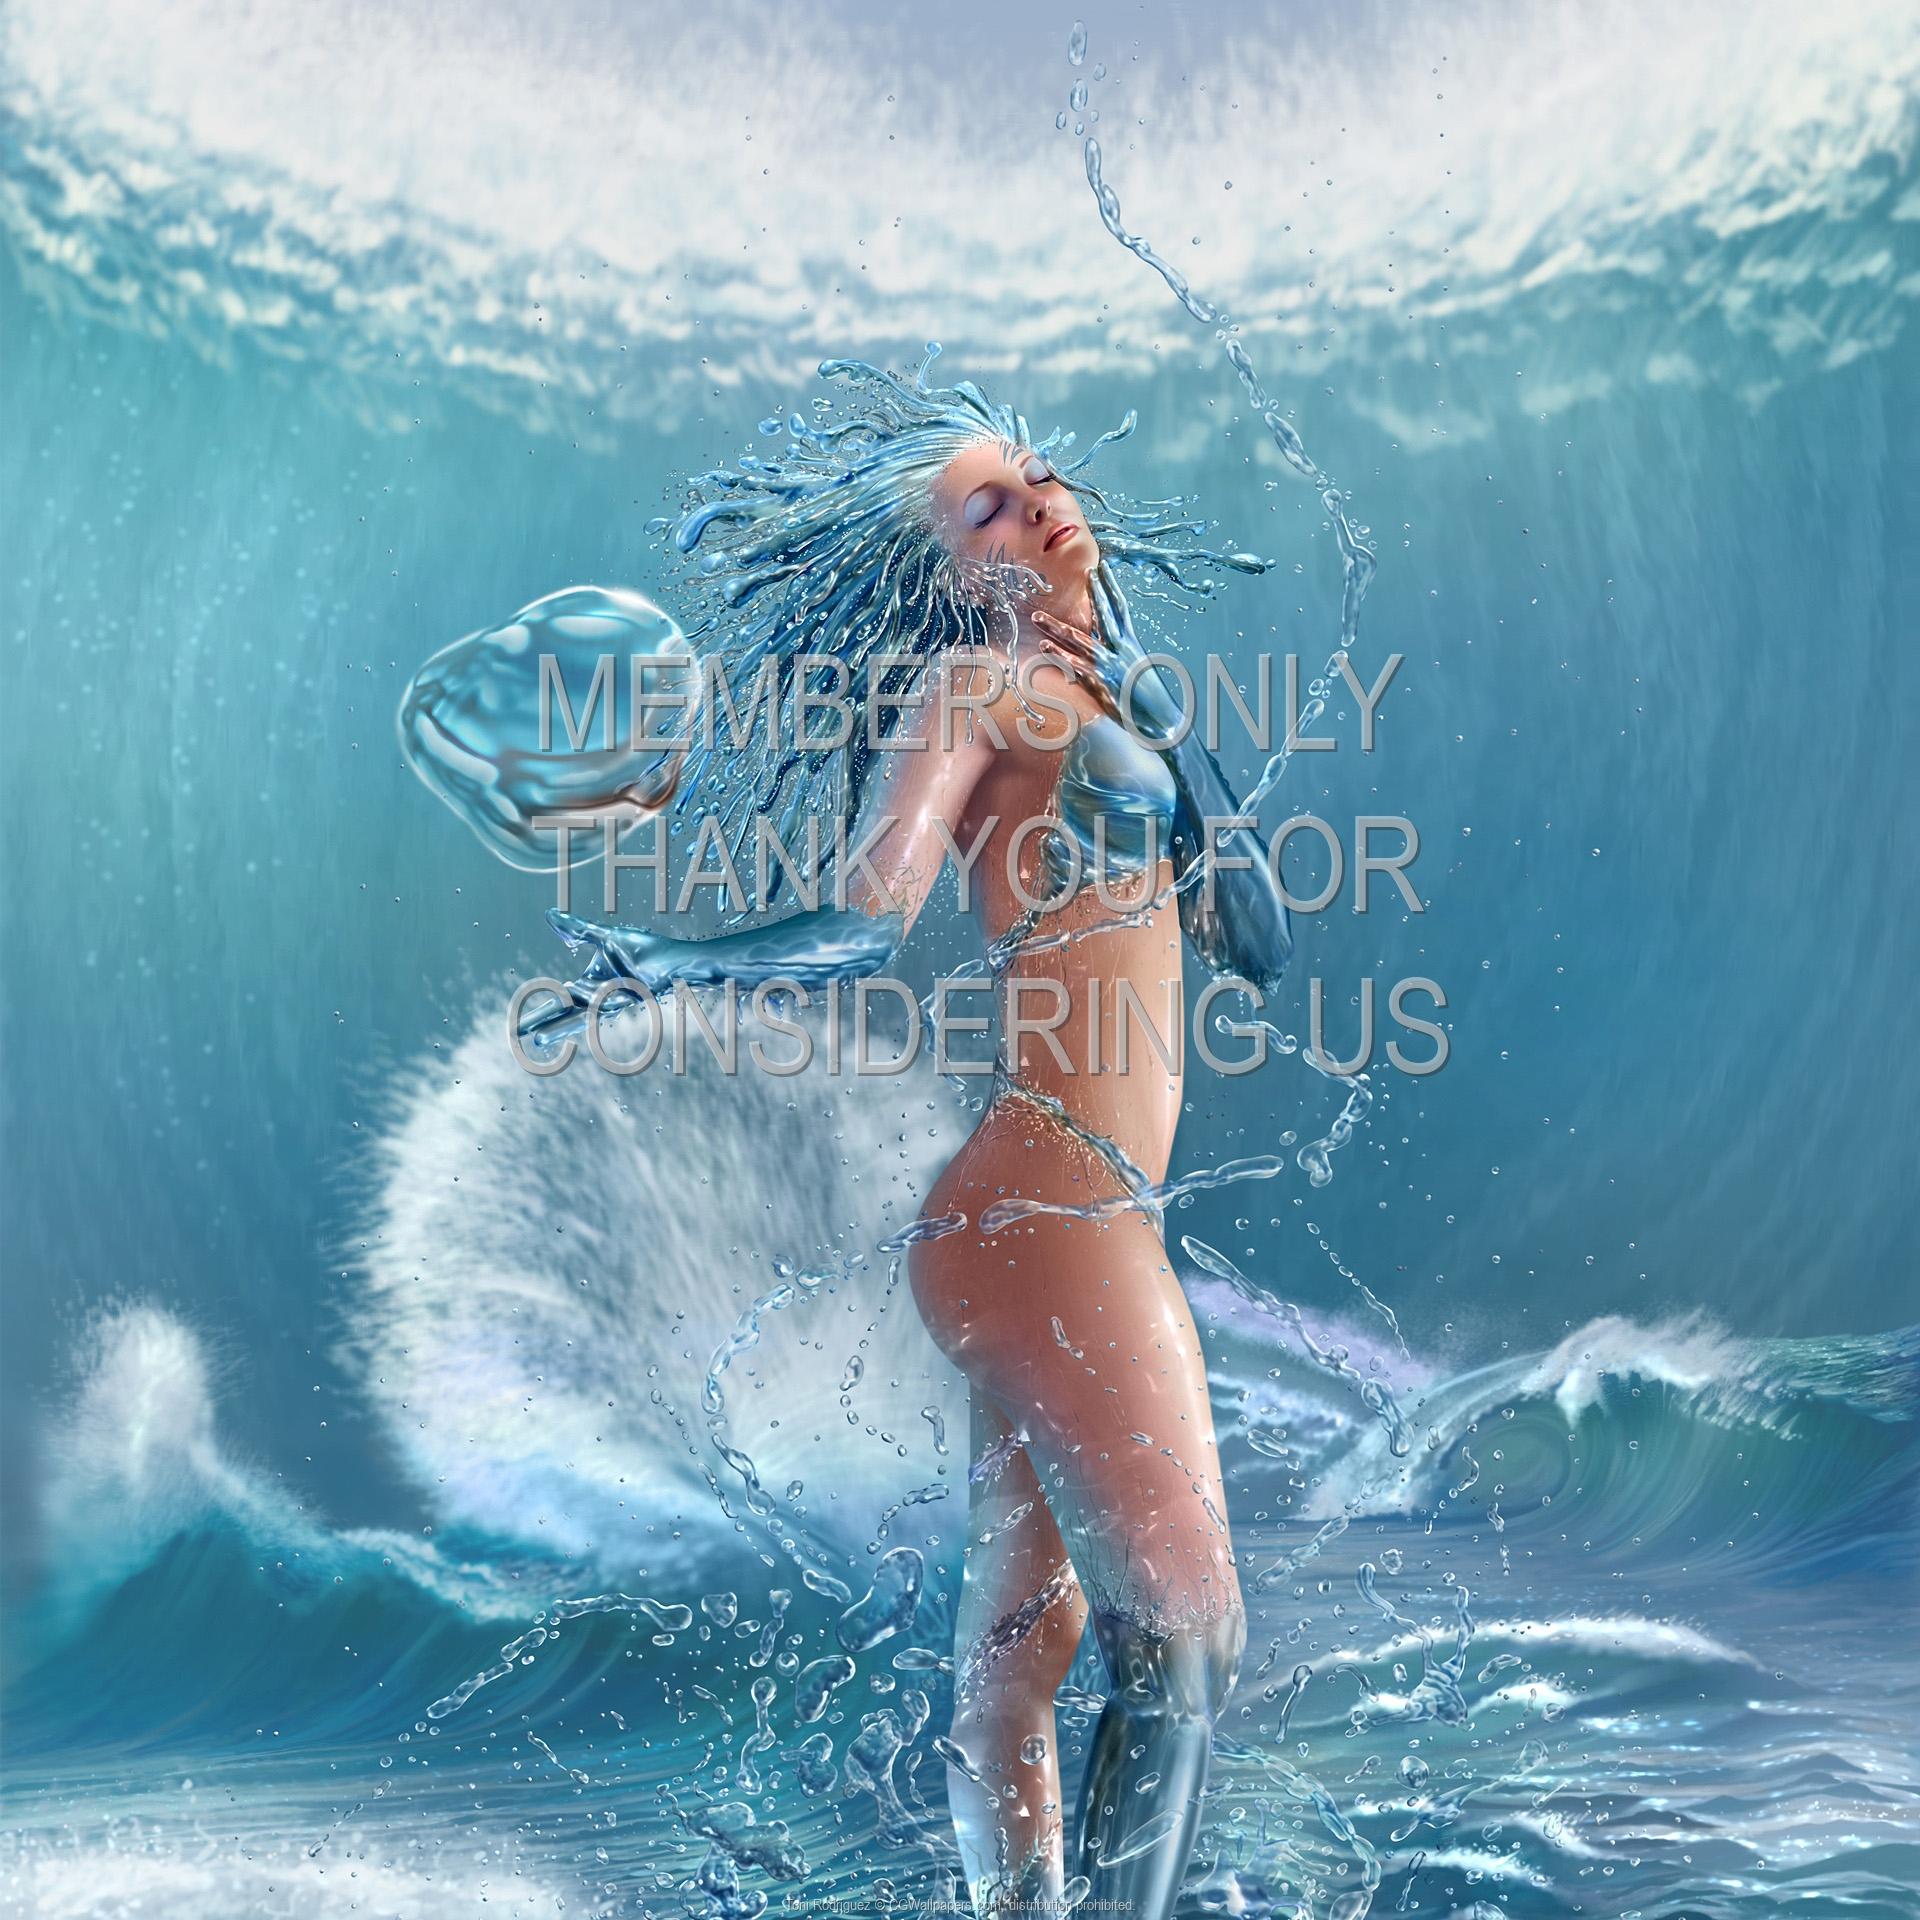 Toni Rodriguez 1080p Horizontal Mobile wallpaper or background 07